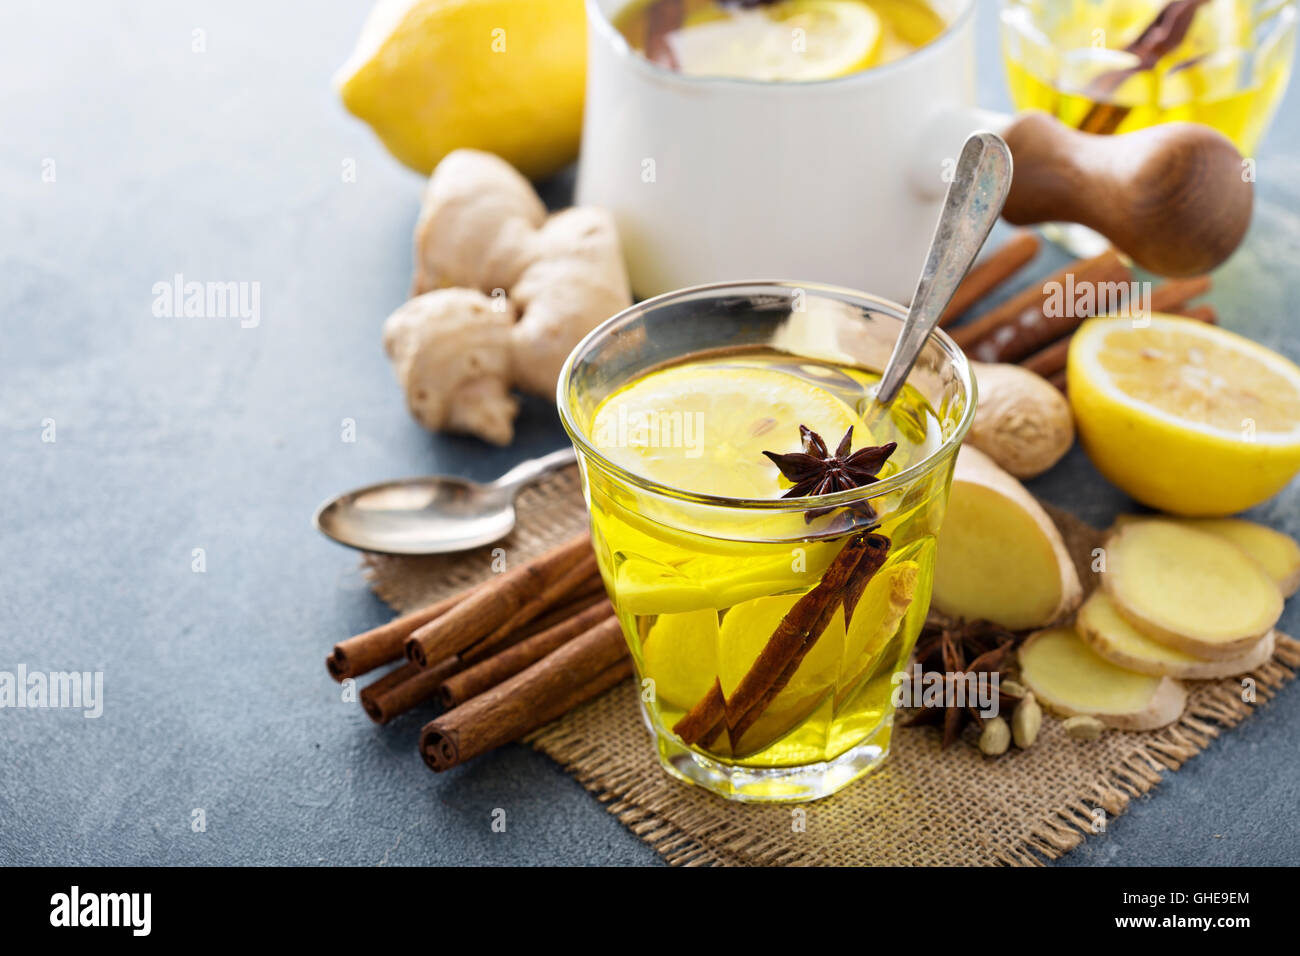 Ginger tea with lemon - Stock Image